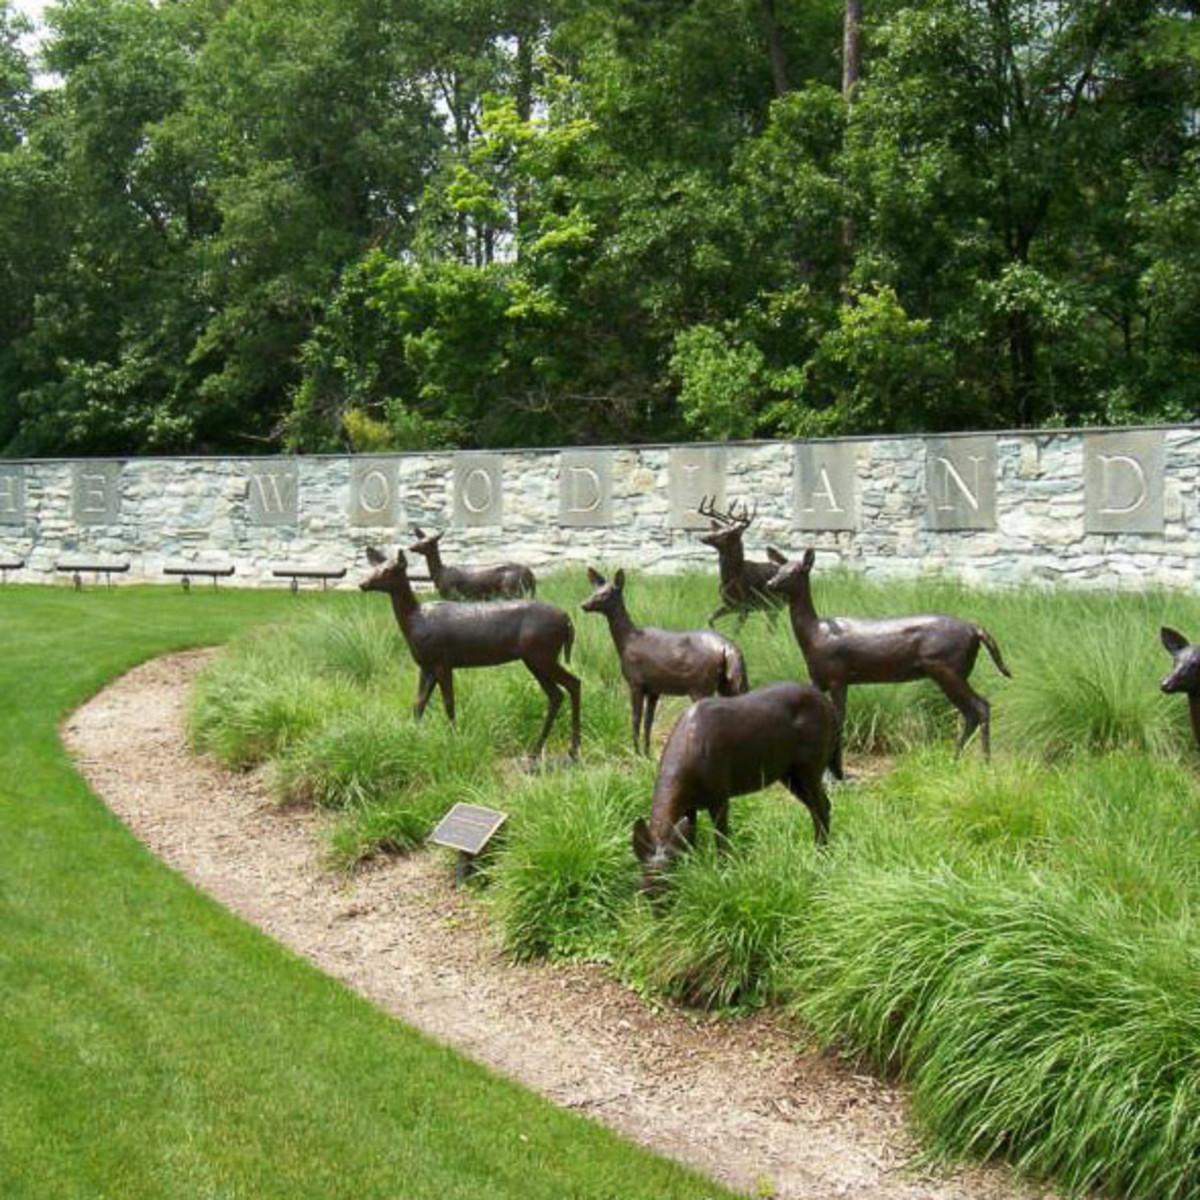 News_The Woodlands_deer